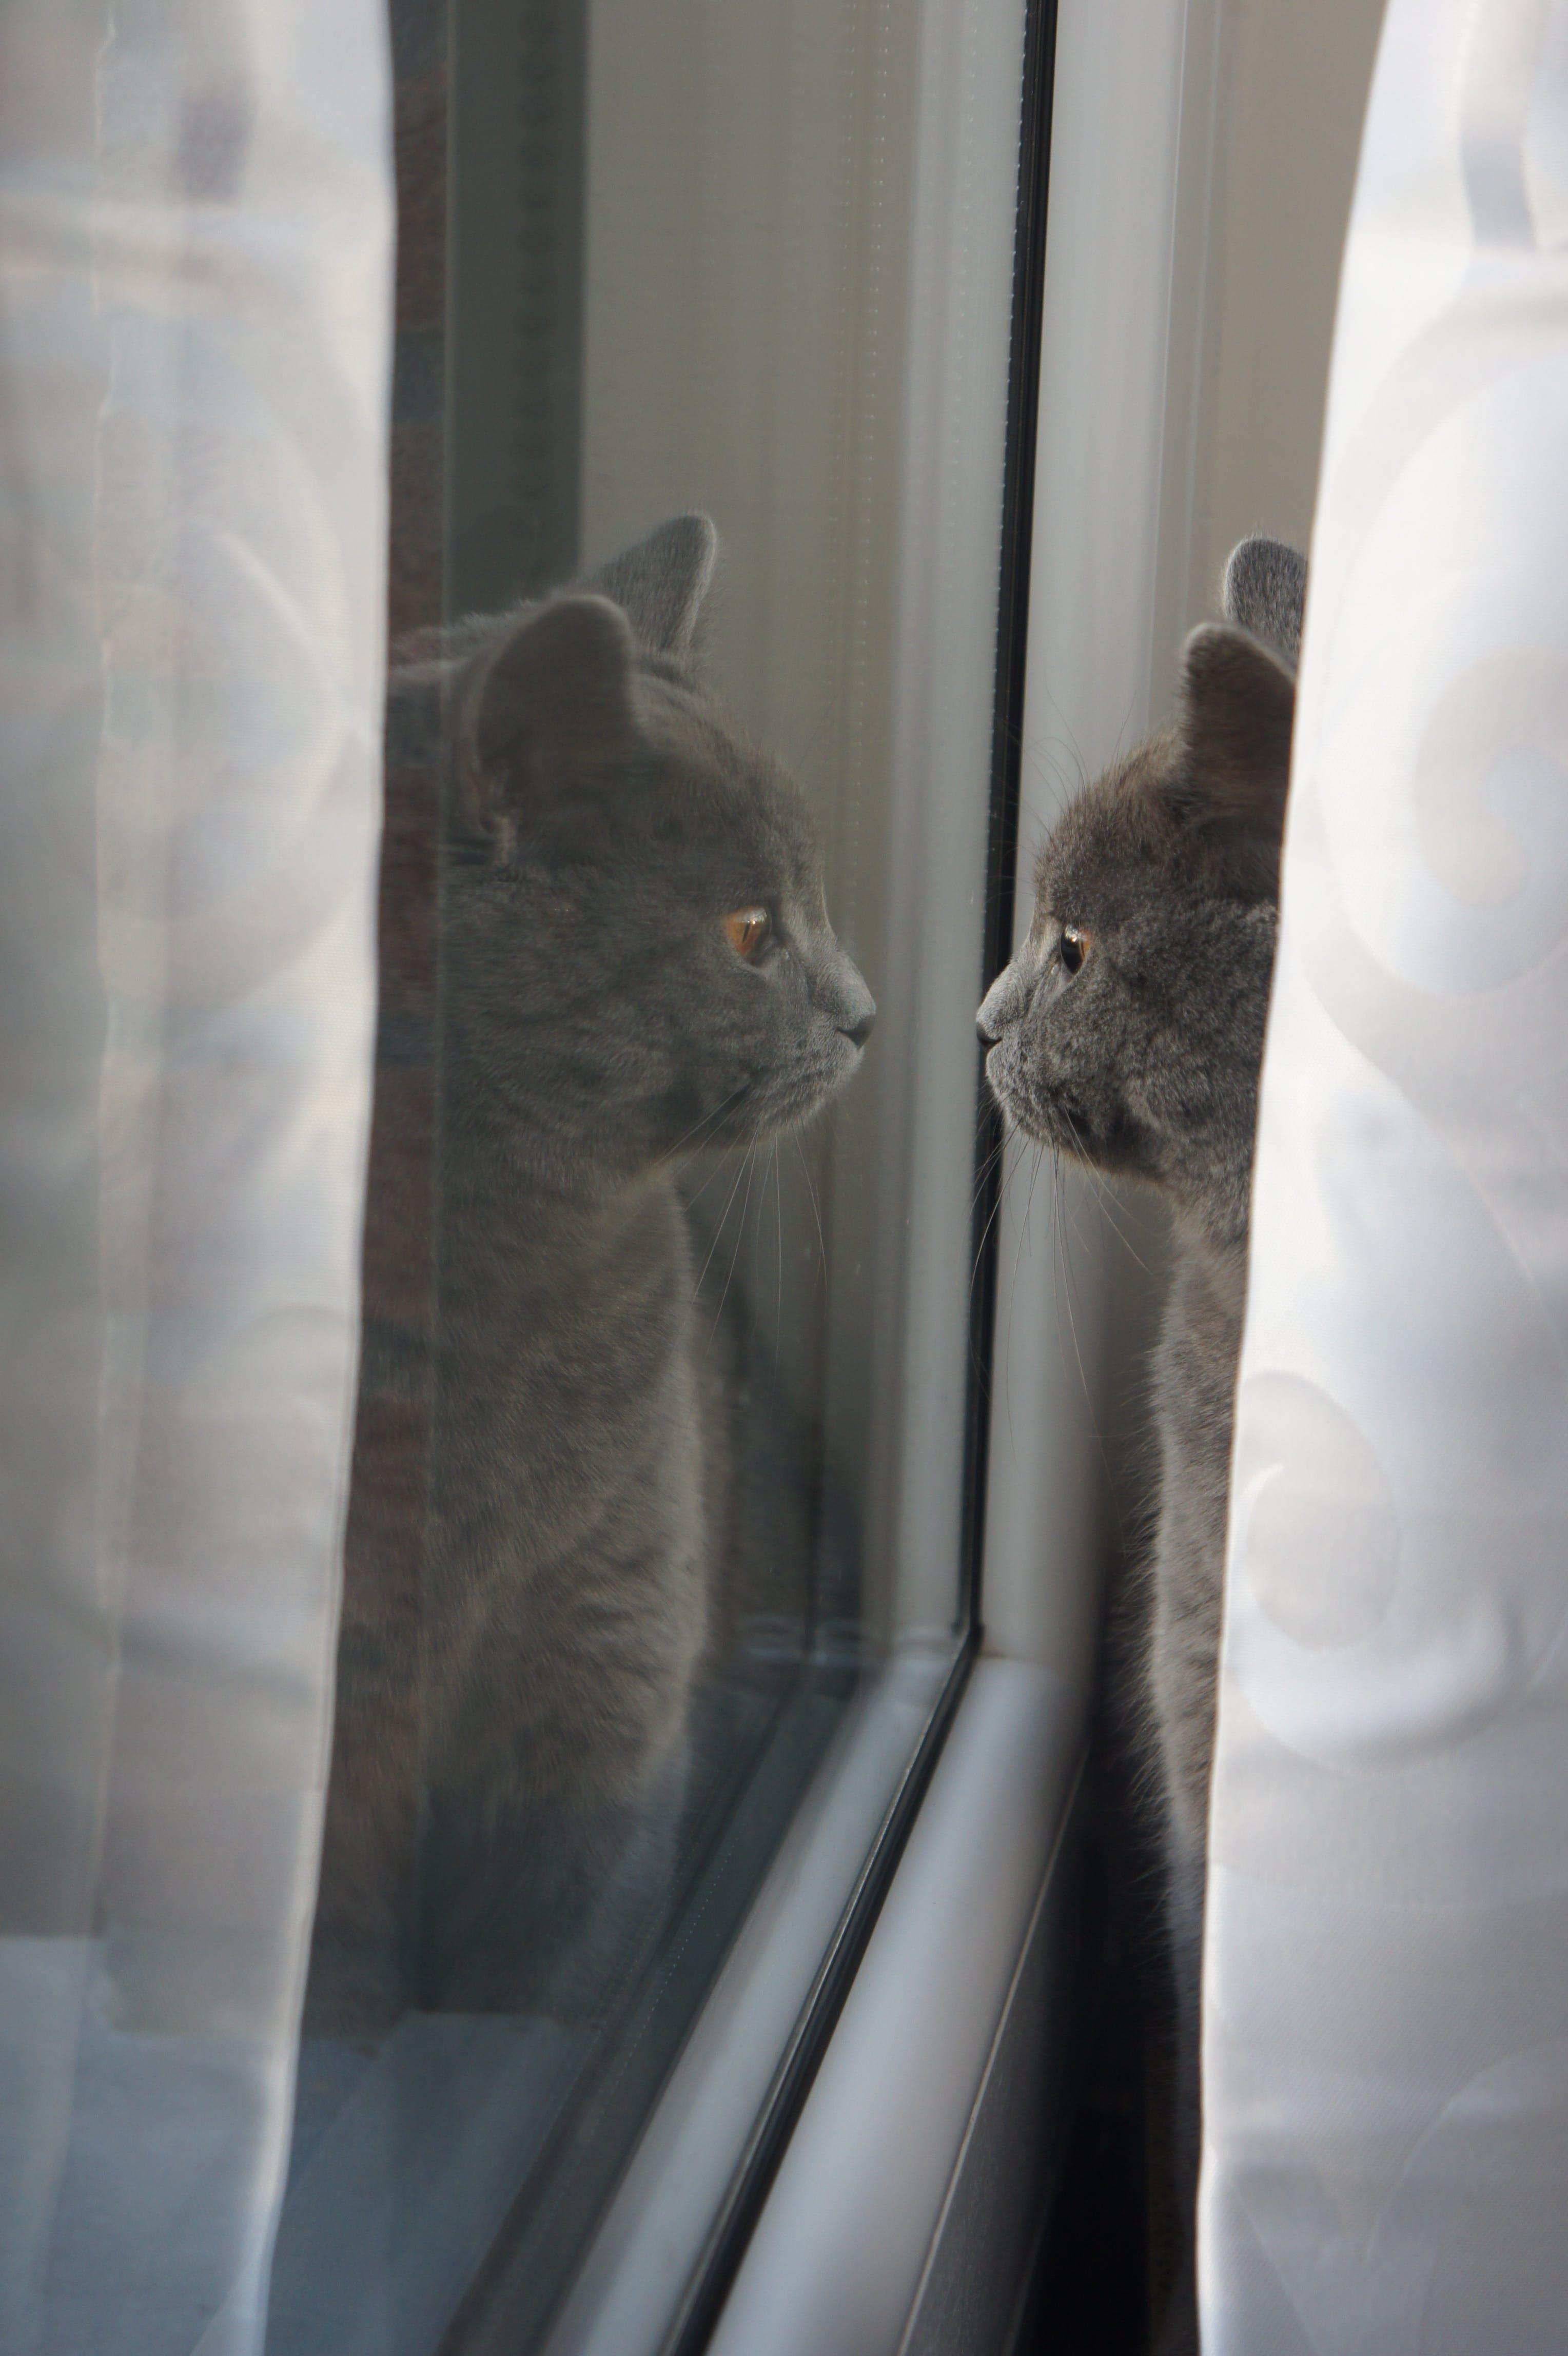 Fotos de stock gratuitas de animal, gato